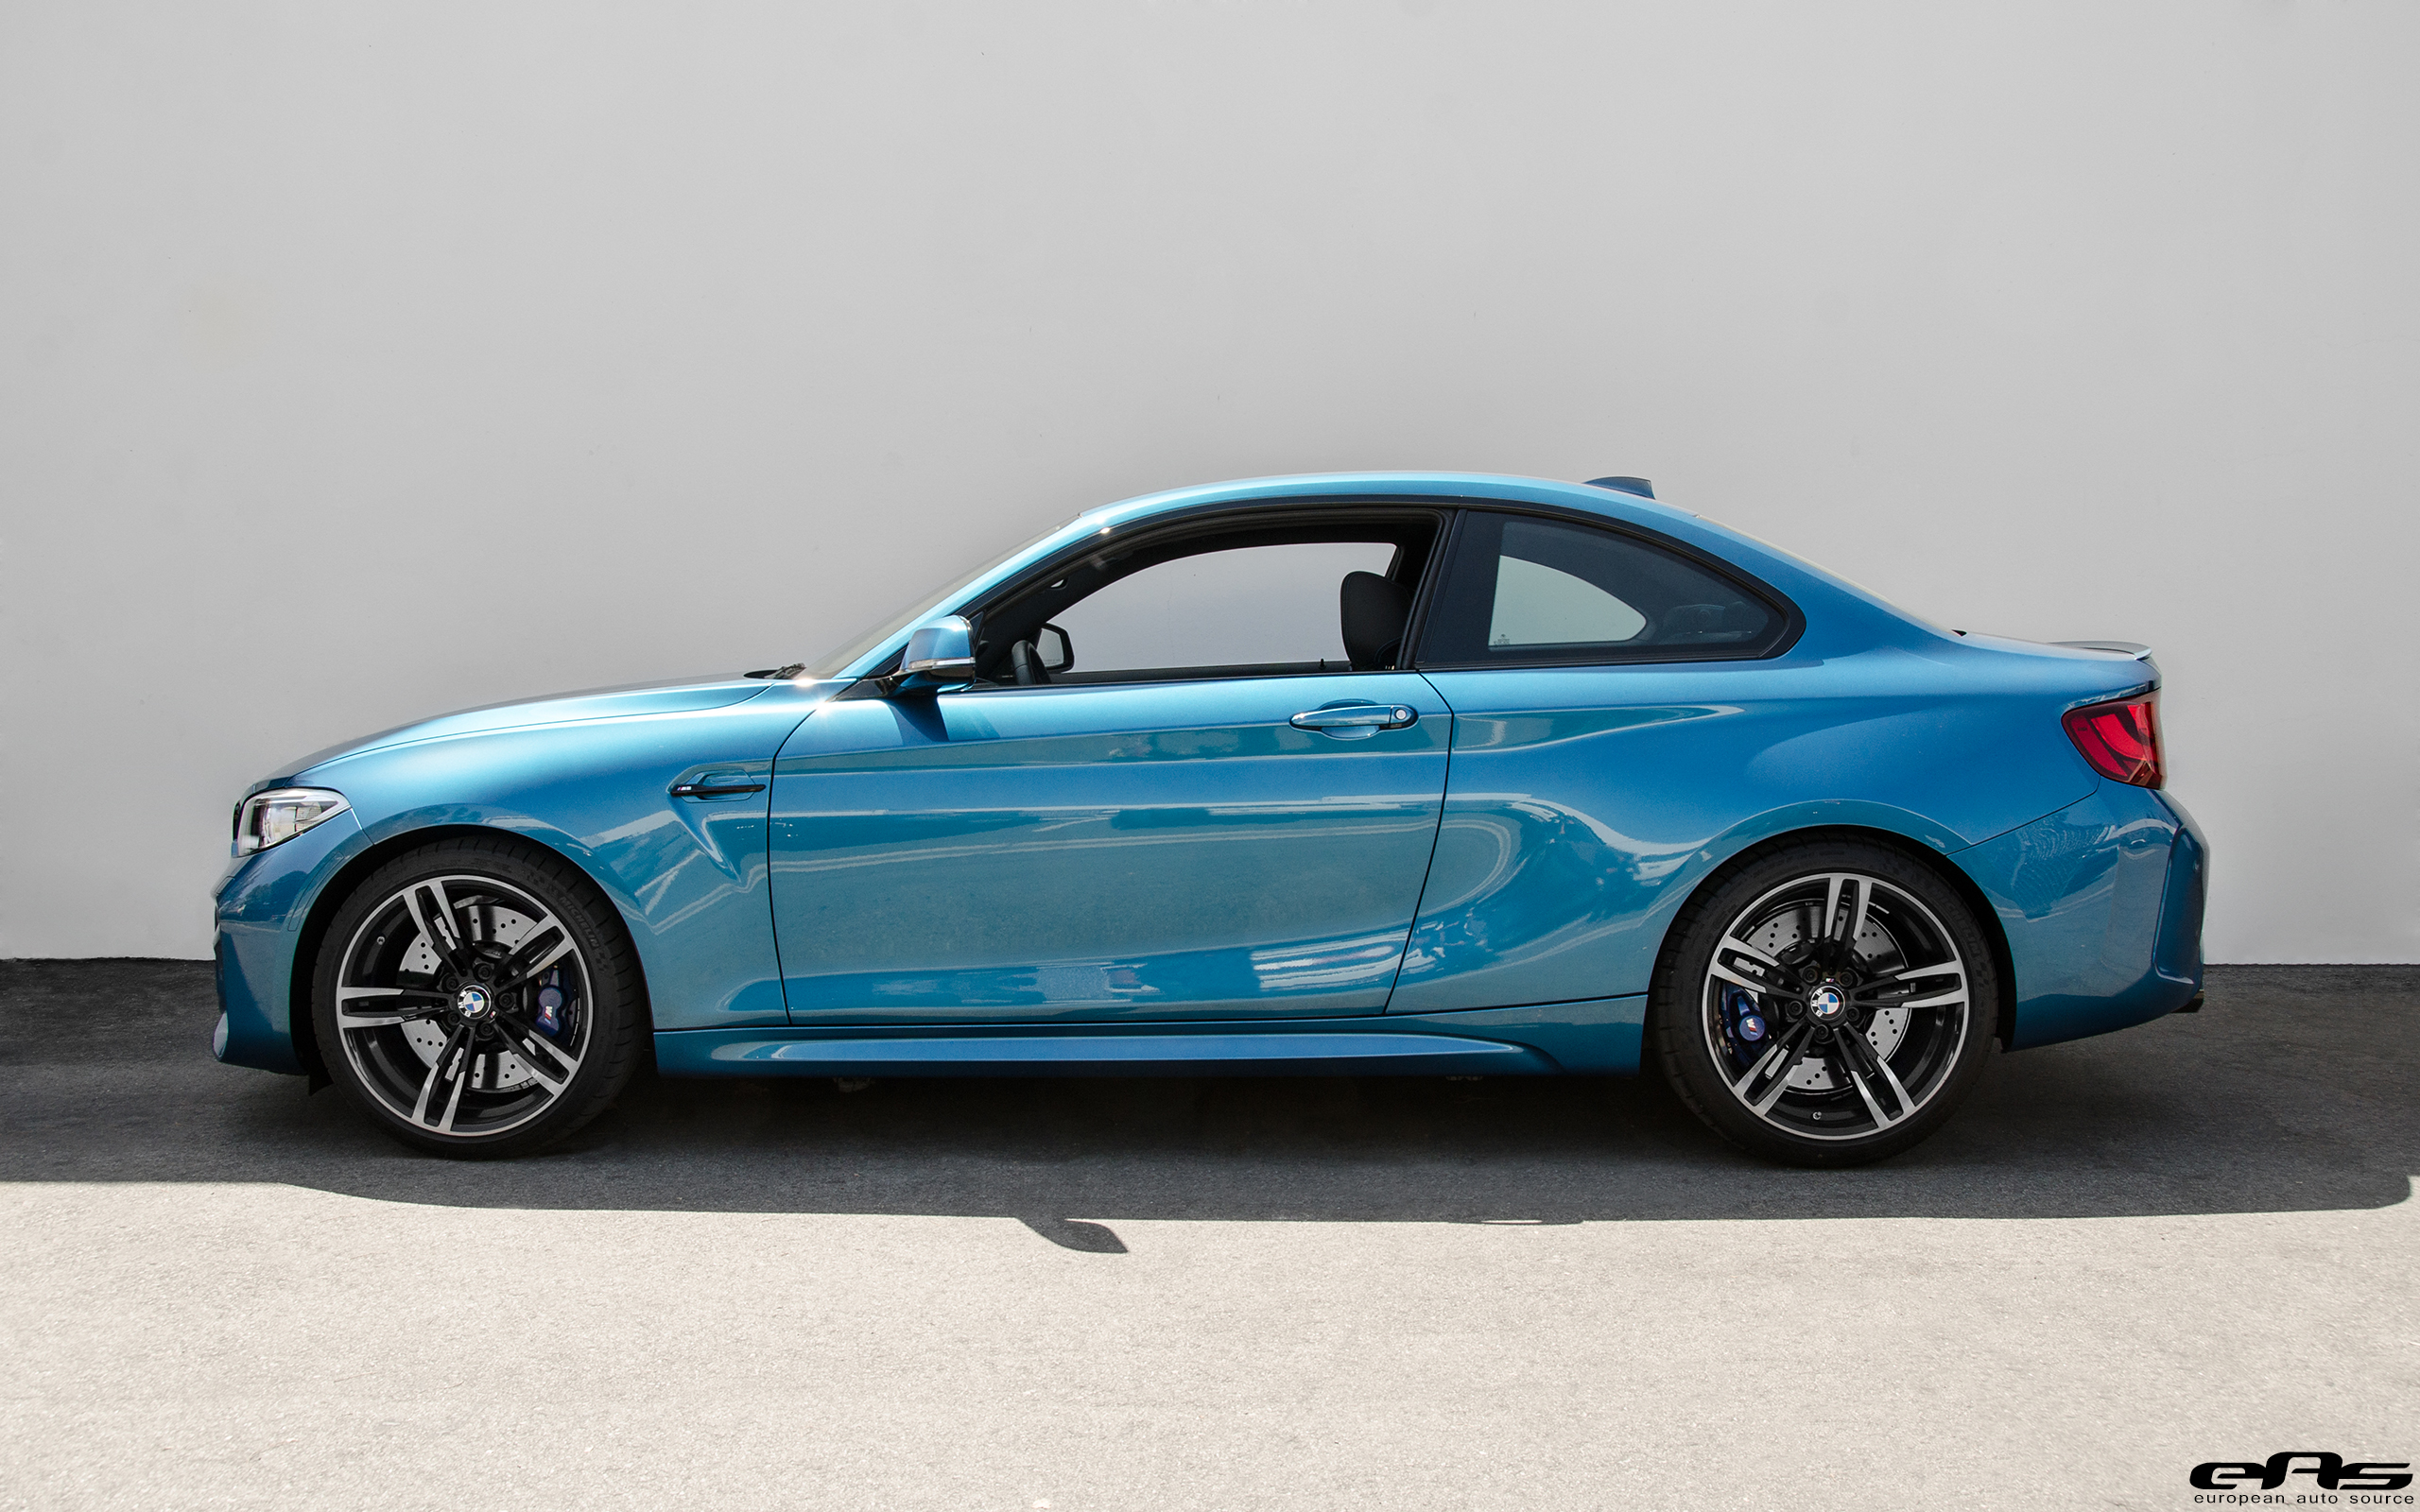 M2 M Performance Exhaust w/ Bluetooth | BMW Performance Parts & Services